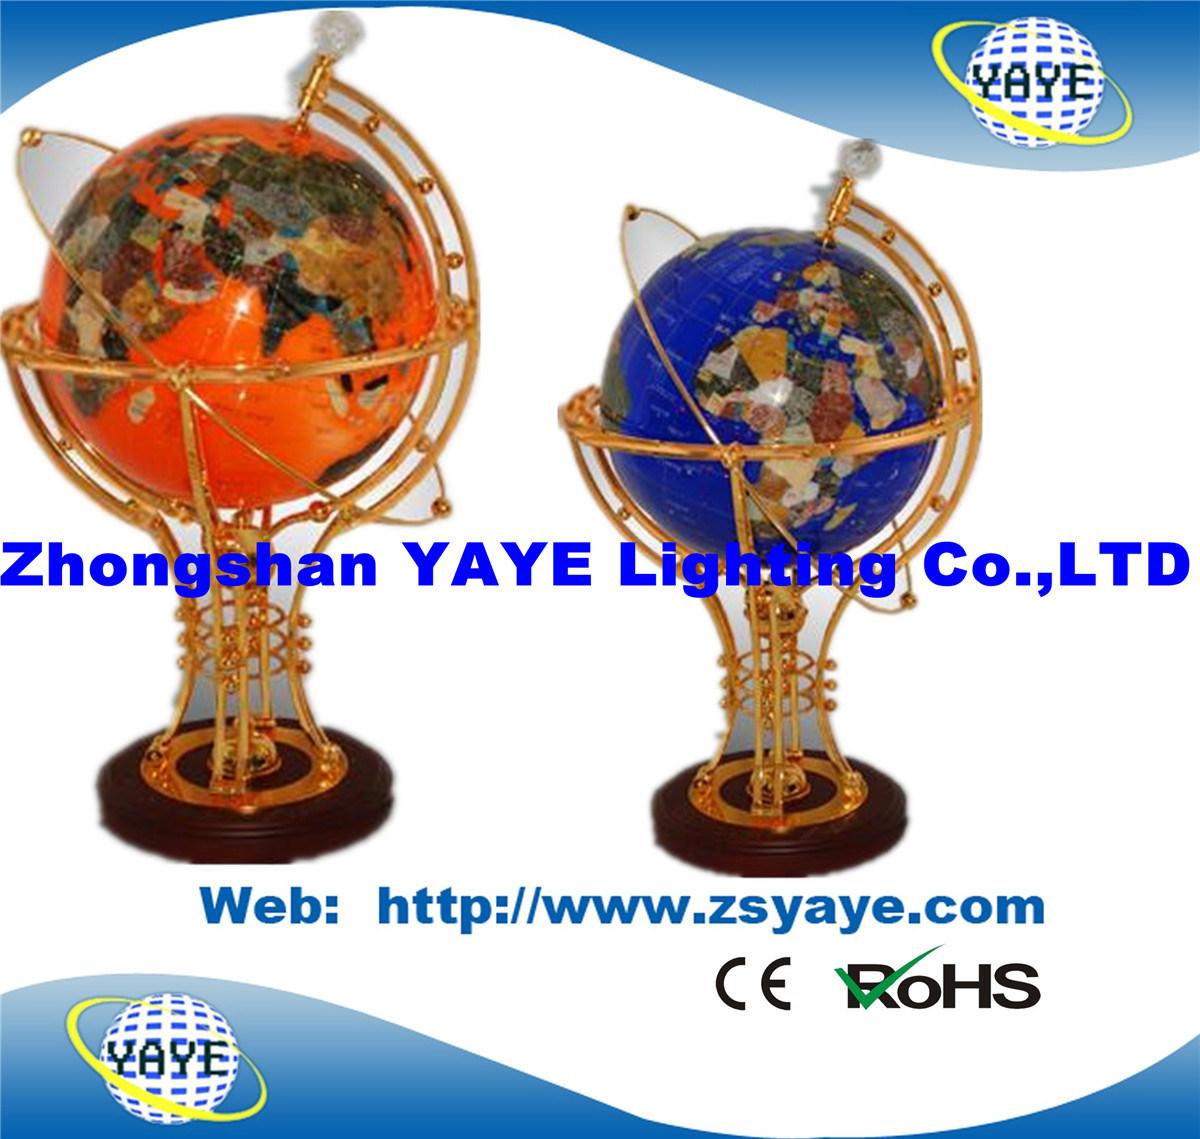 Yaye 18 Hot Sell Ce/ RoHS Lighting Gemstone Globe / Gemstone Globes / World Globes with Lighting